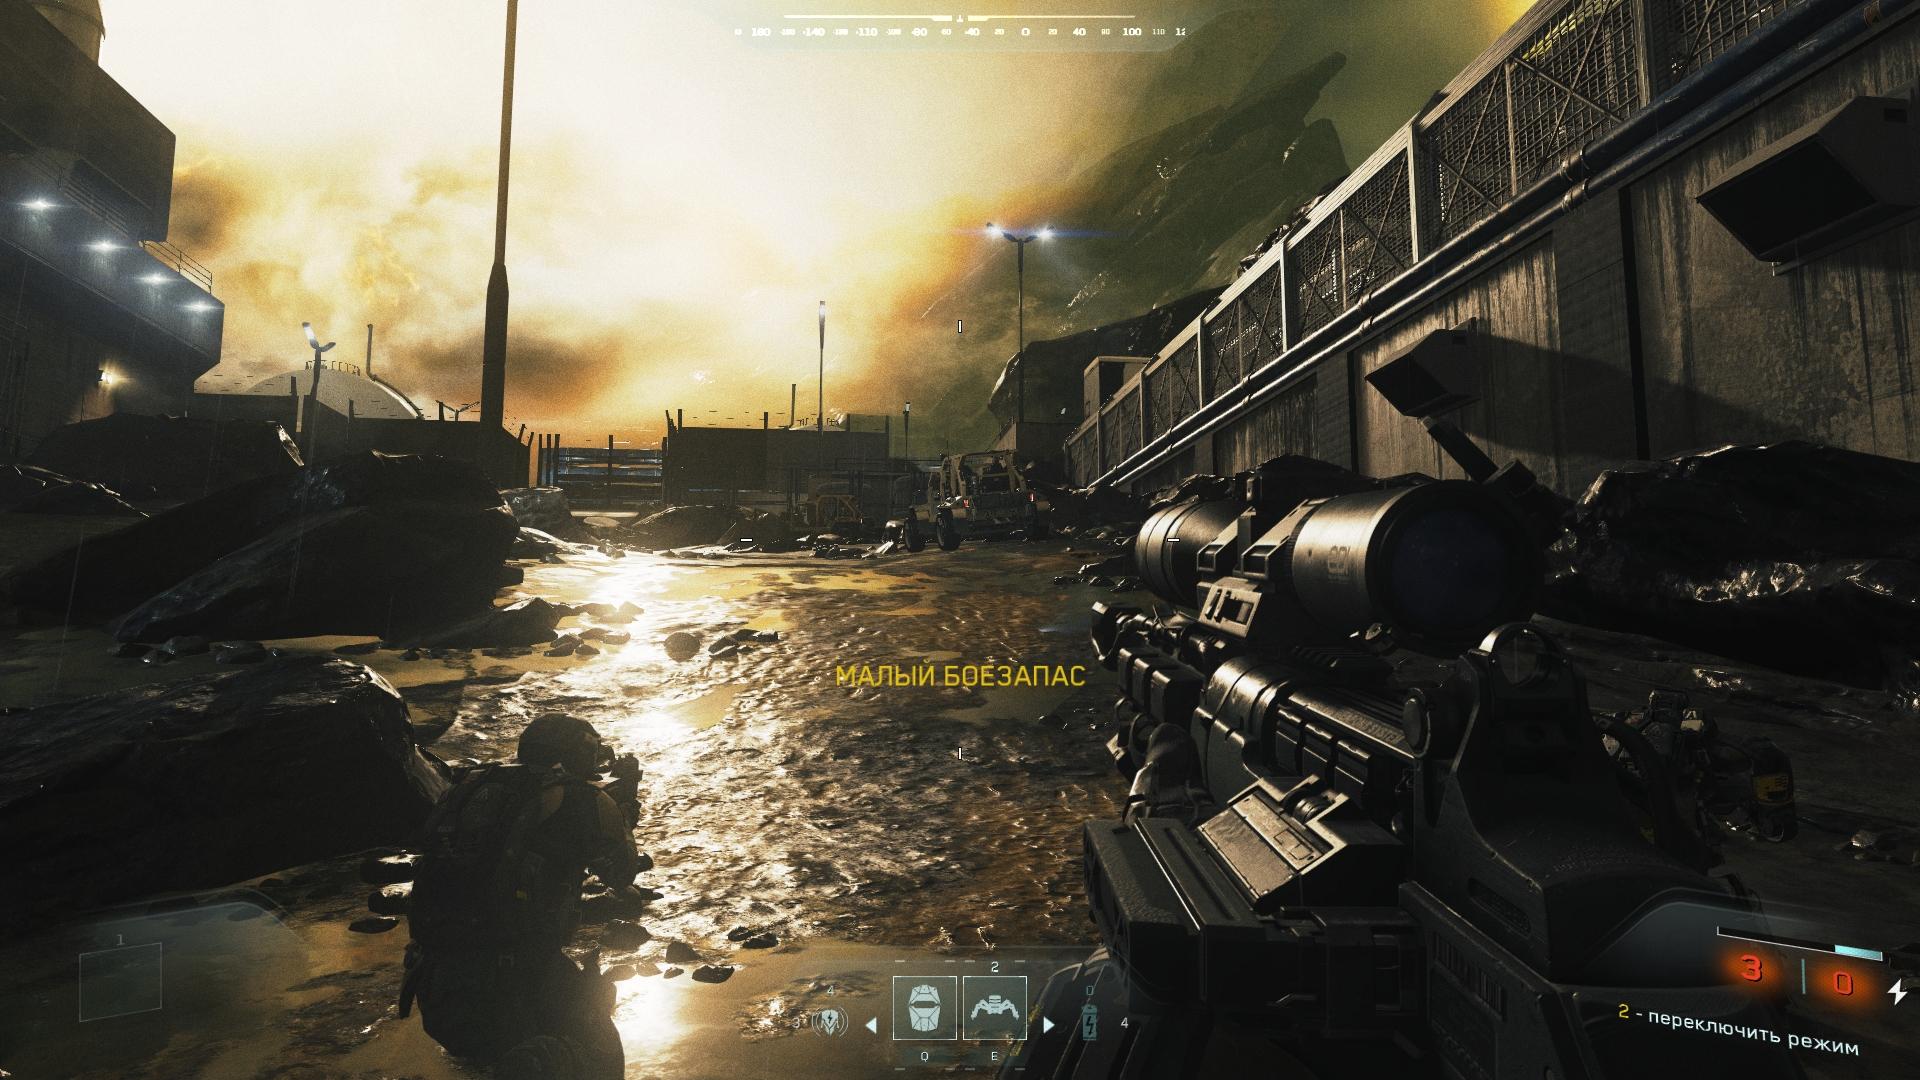 00088.Jpg - Call of Duty: Infinite Warfare